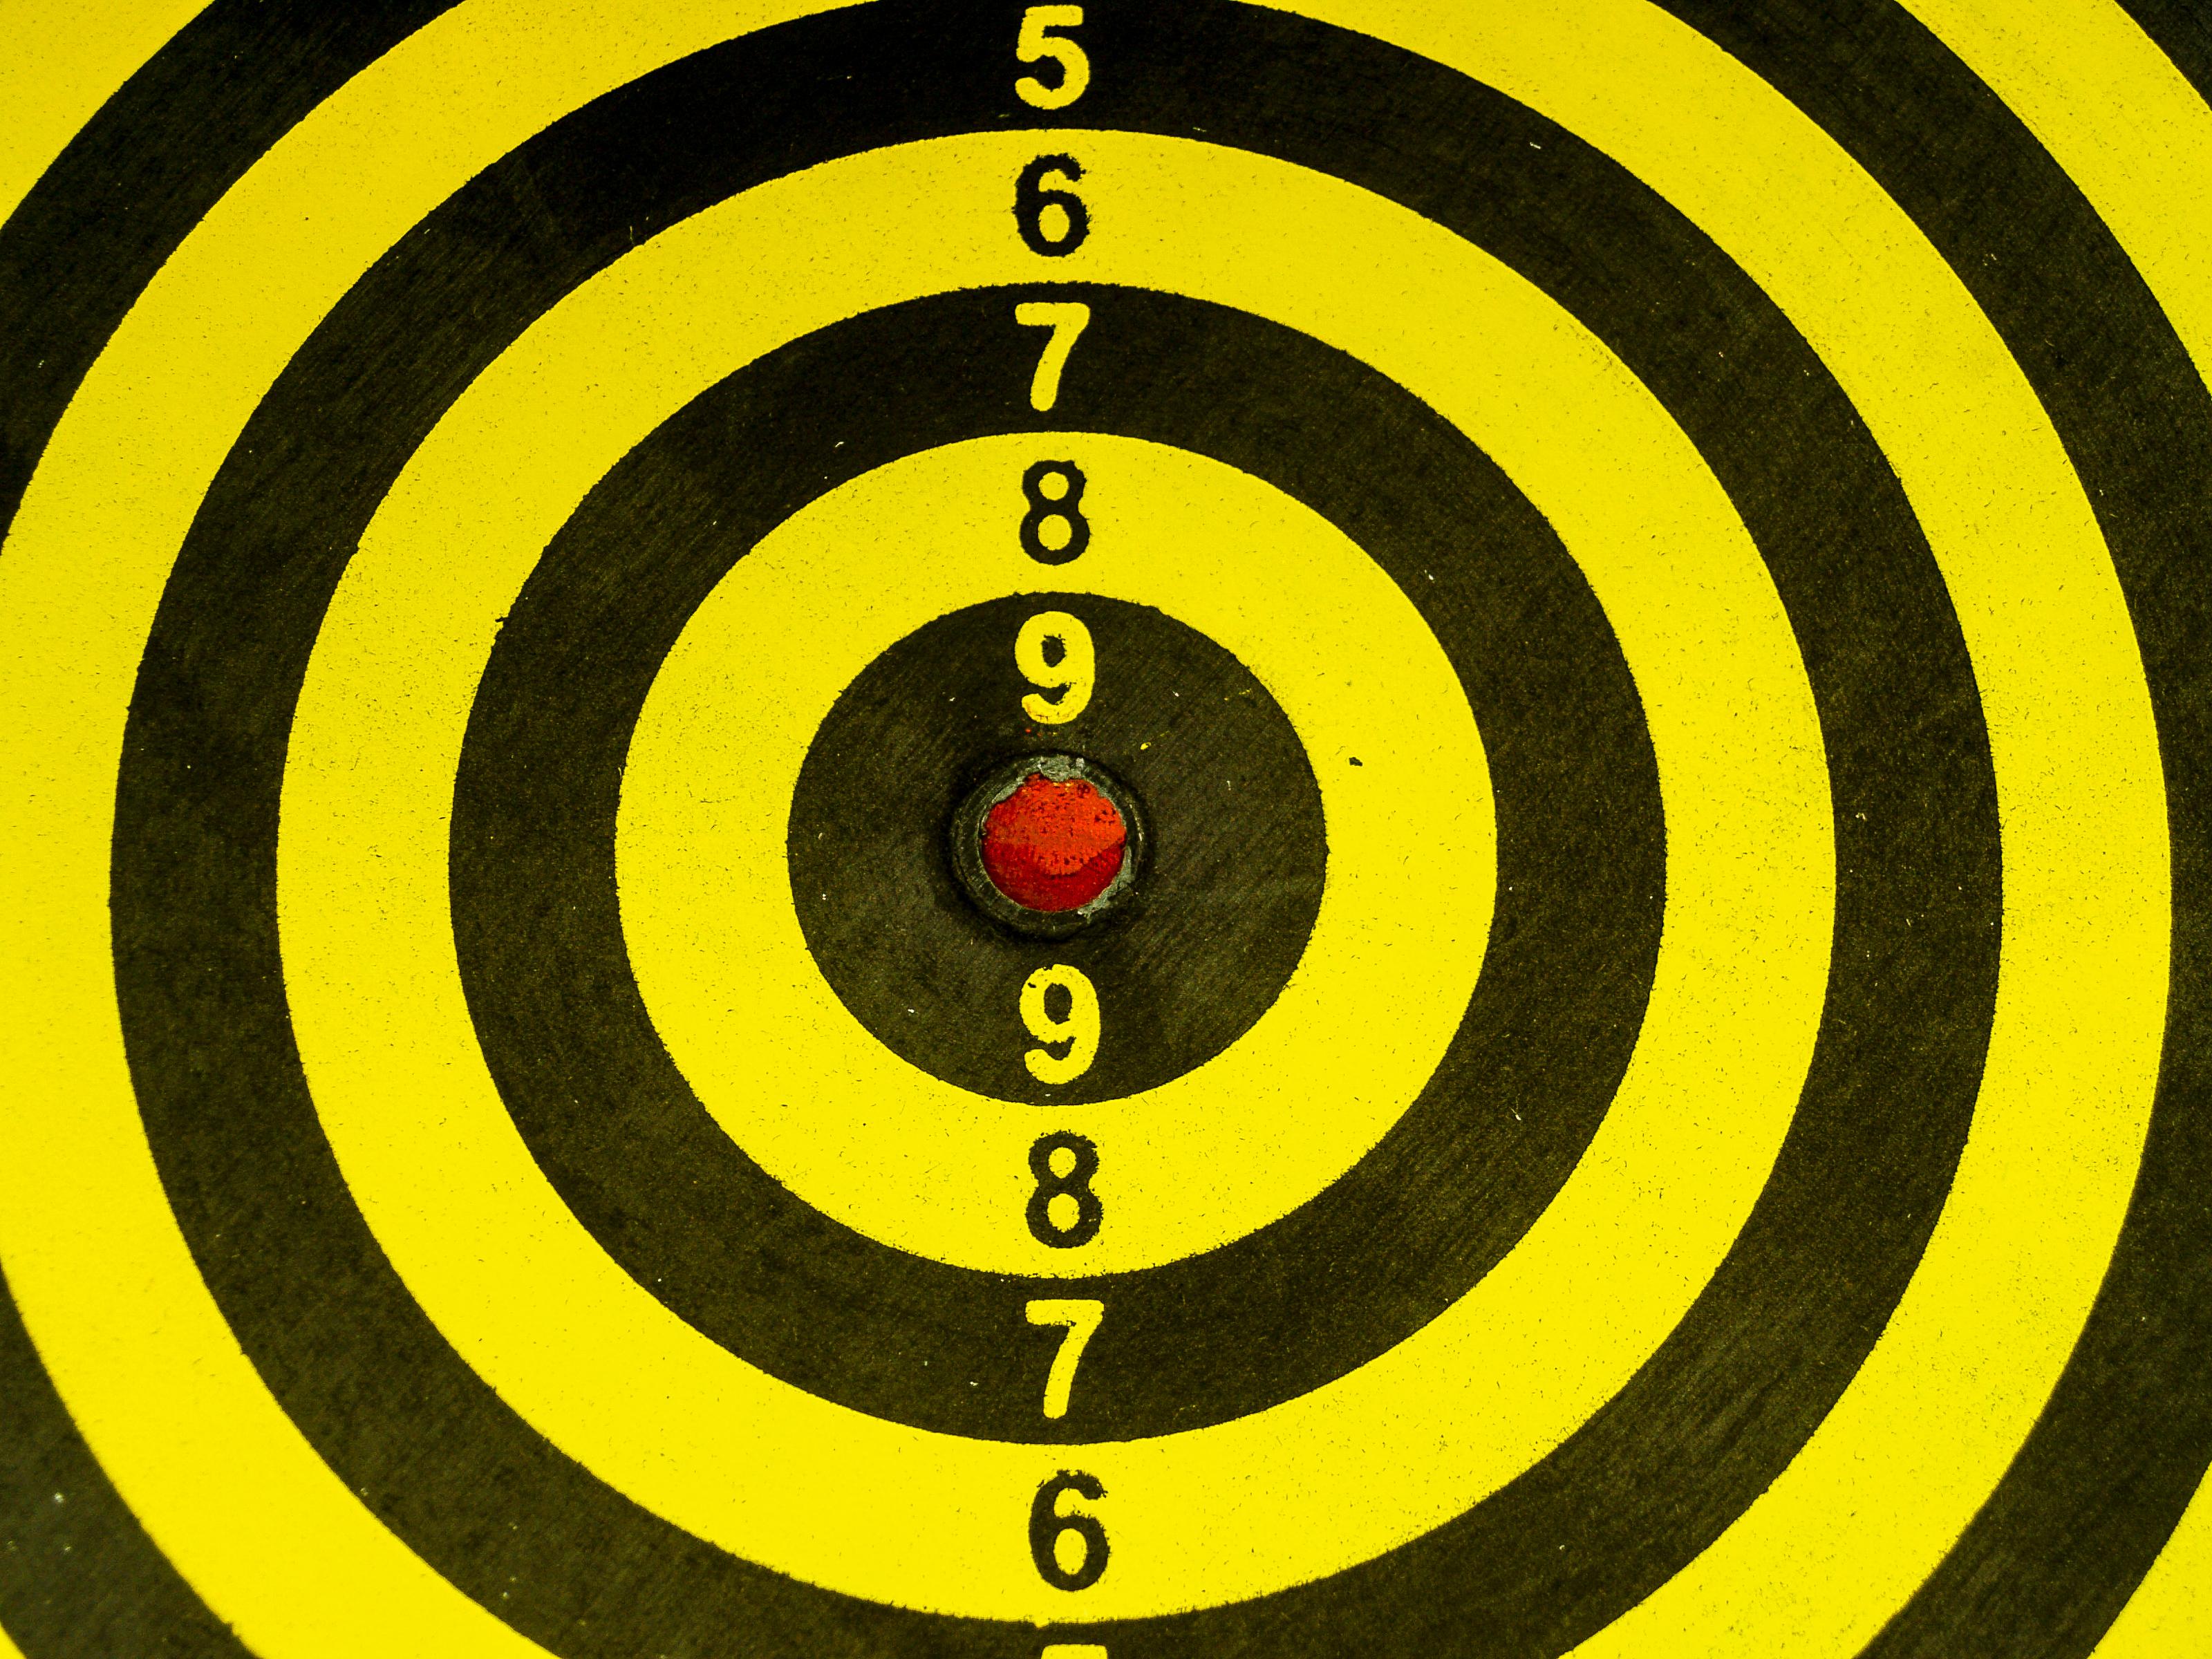 free images   dartboard  board  dart  game  center  sport